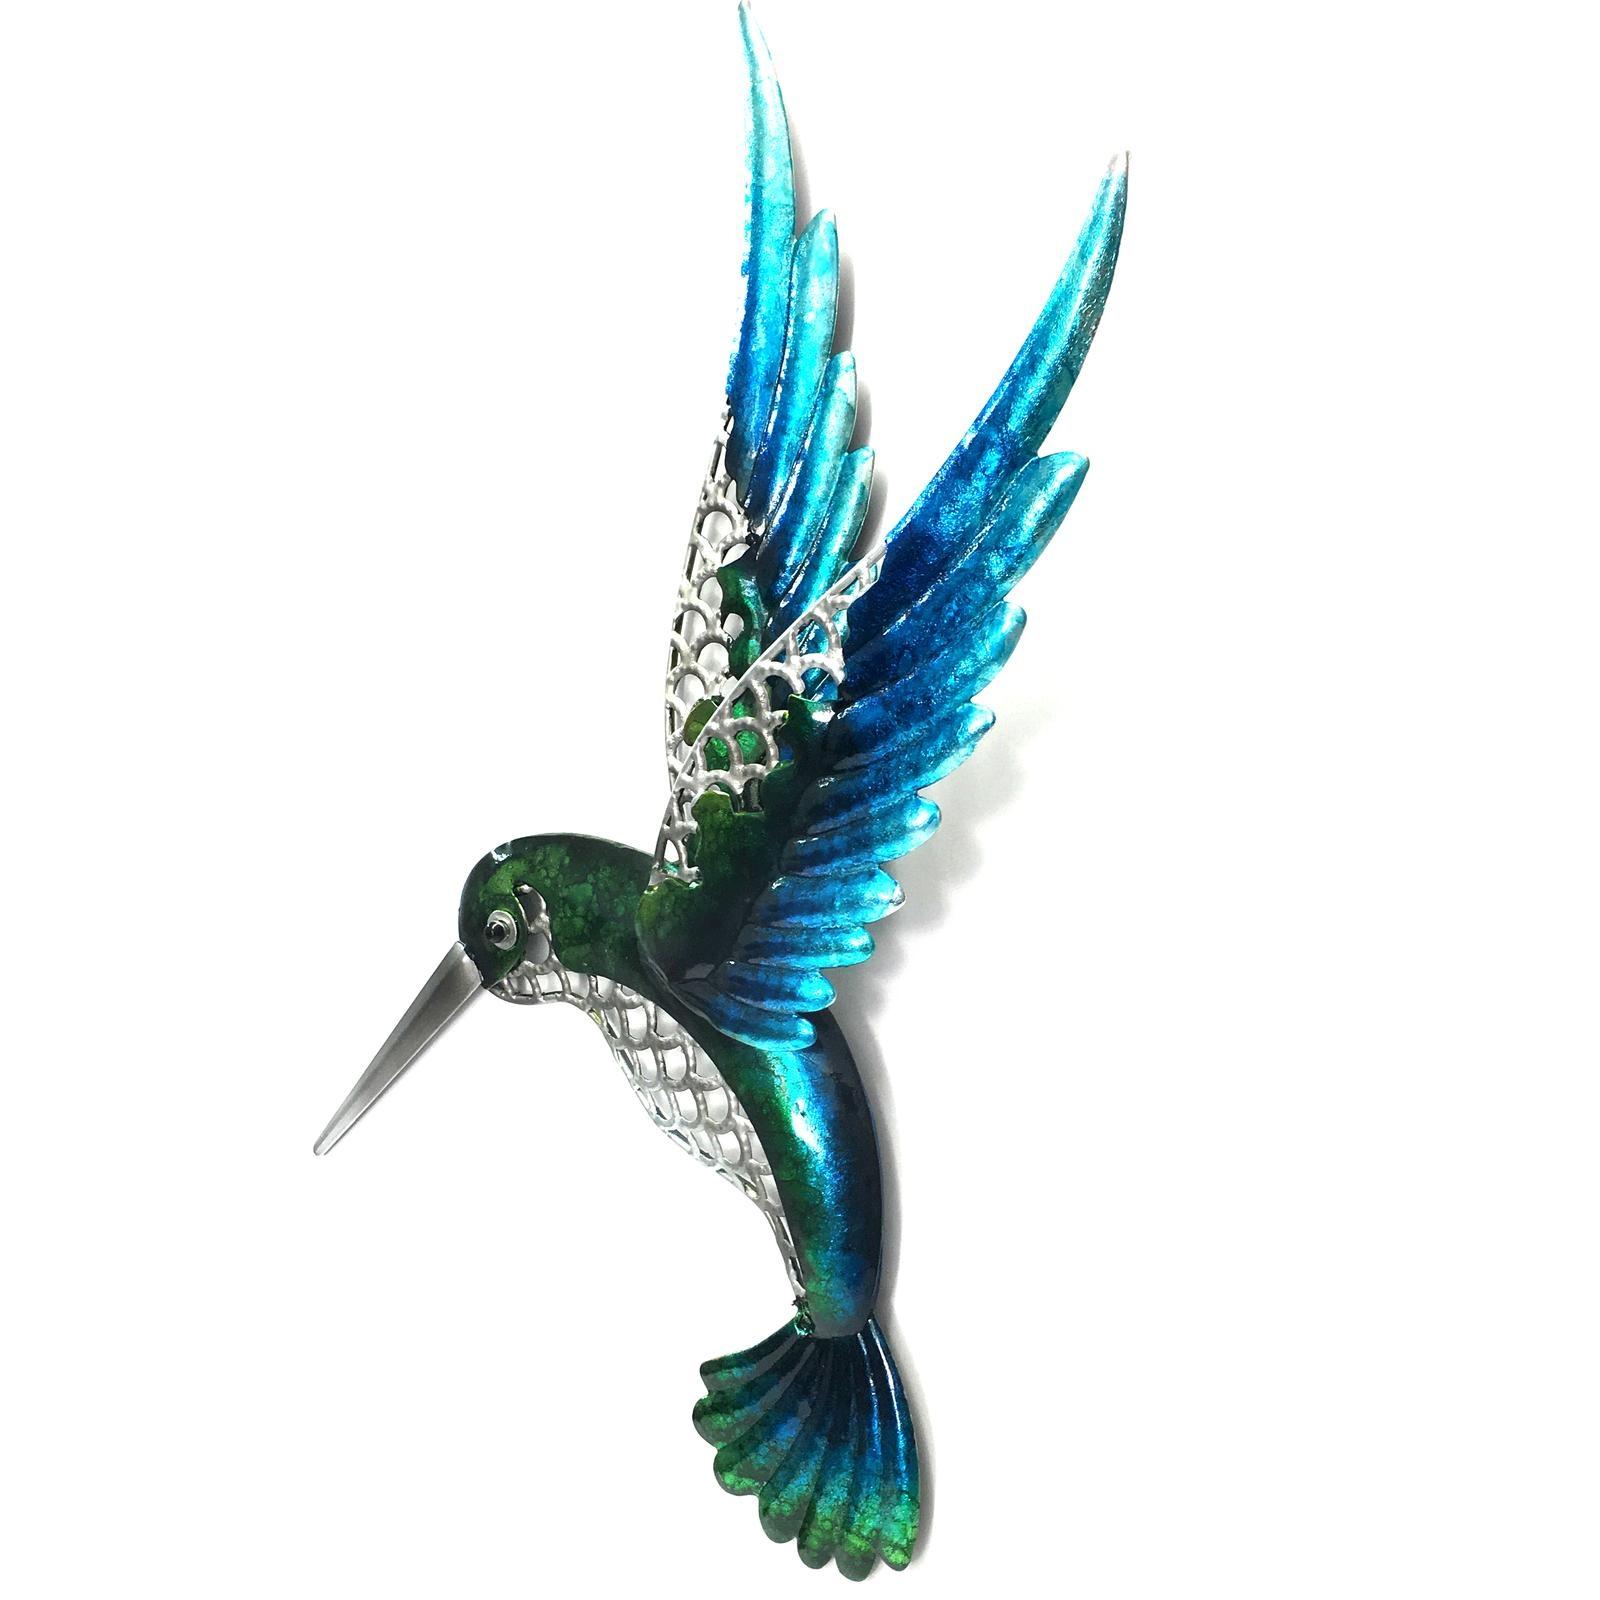 Hummingbird Metal Wall Art 46Cm With Regard To Hummingbird Metal Wall Art (Image 10 of 20)